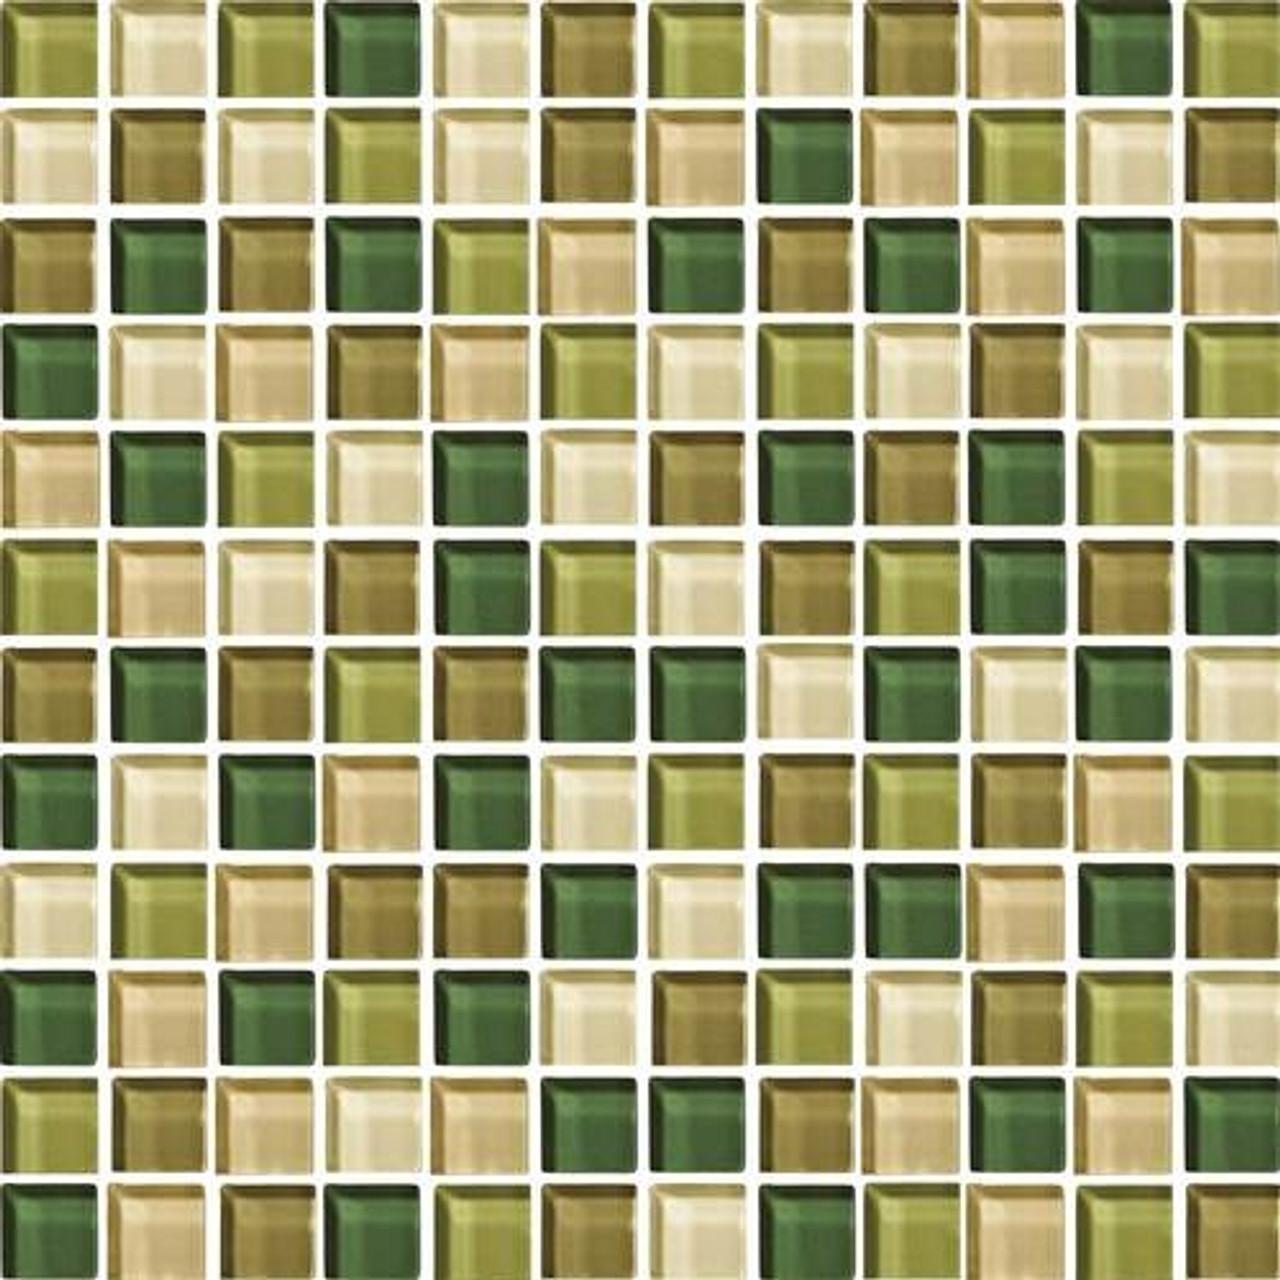 daltile color wave glass cw25 rain forest blend 1 x 1 dal tile glass tile glossy